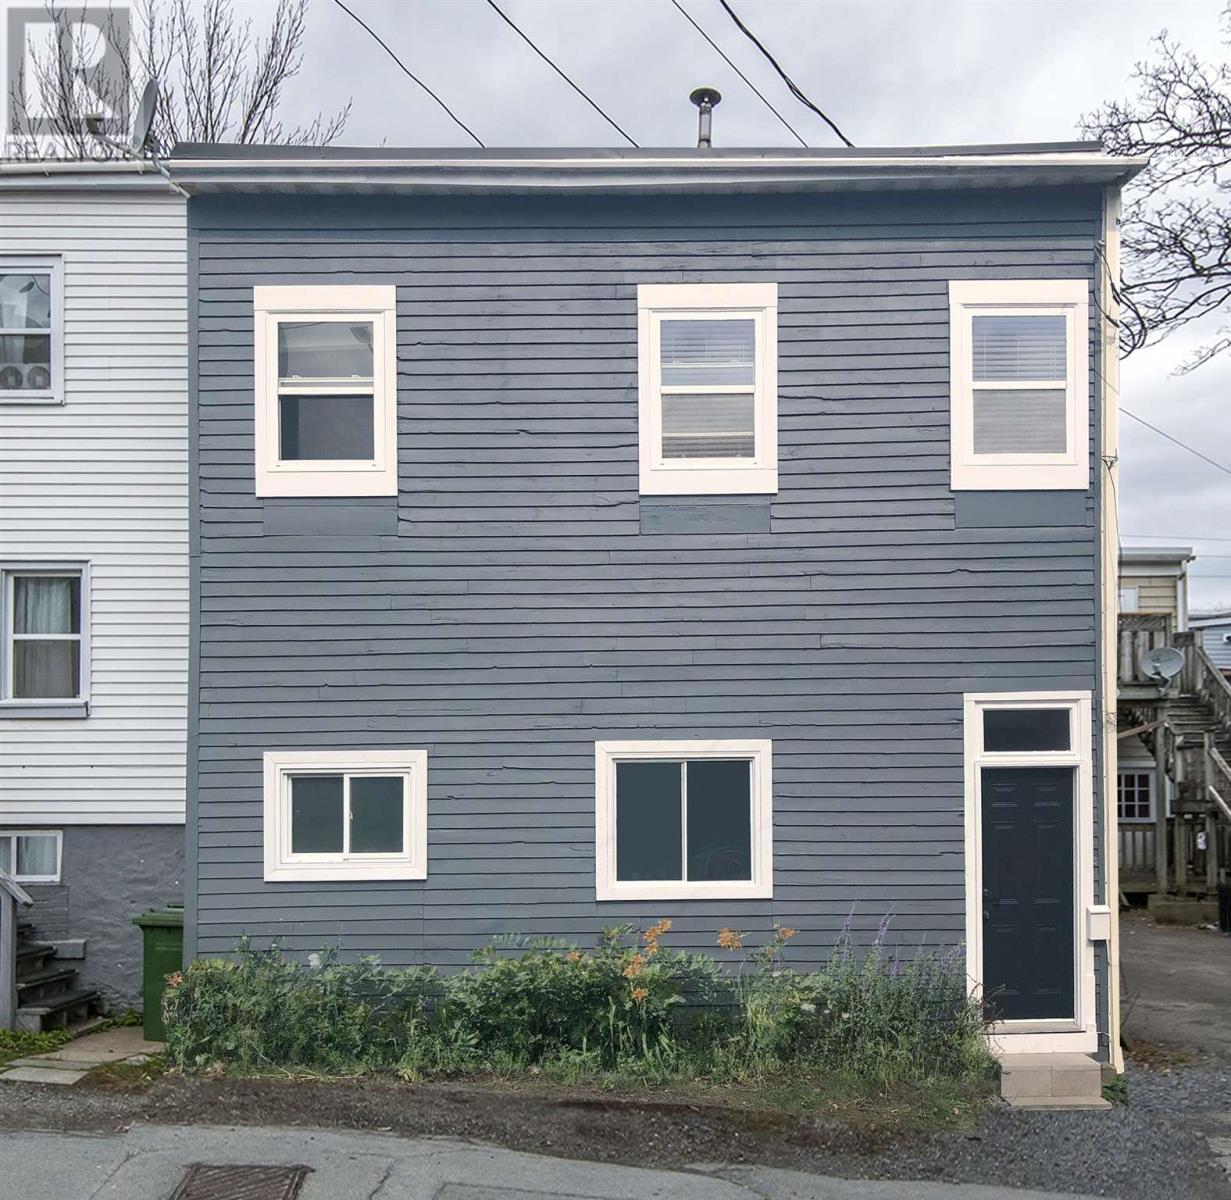 5383 - 5385 Waverly Terrace